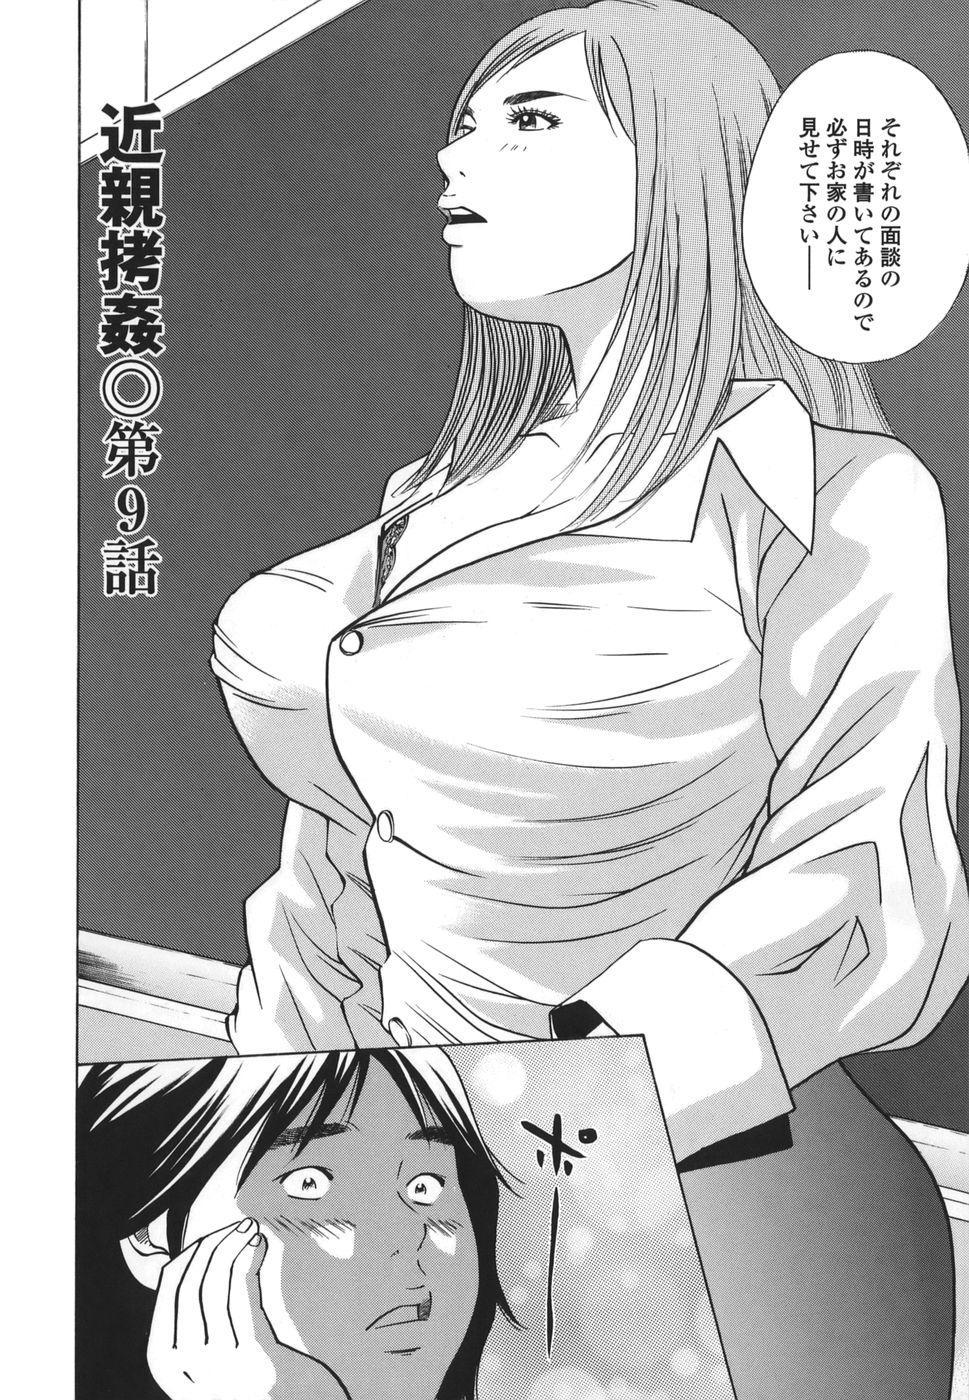 Kinshin Goukan - Near Relation Rapes 167